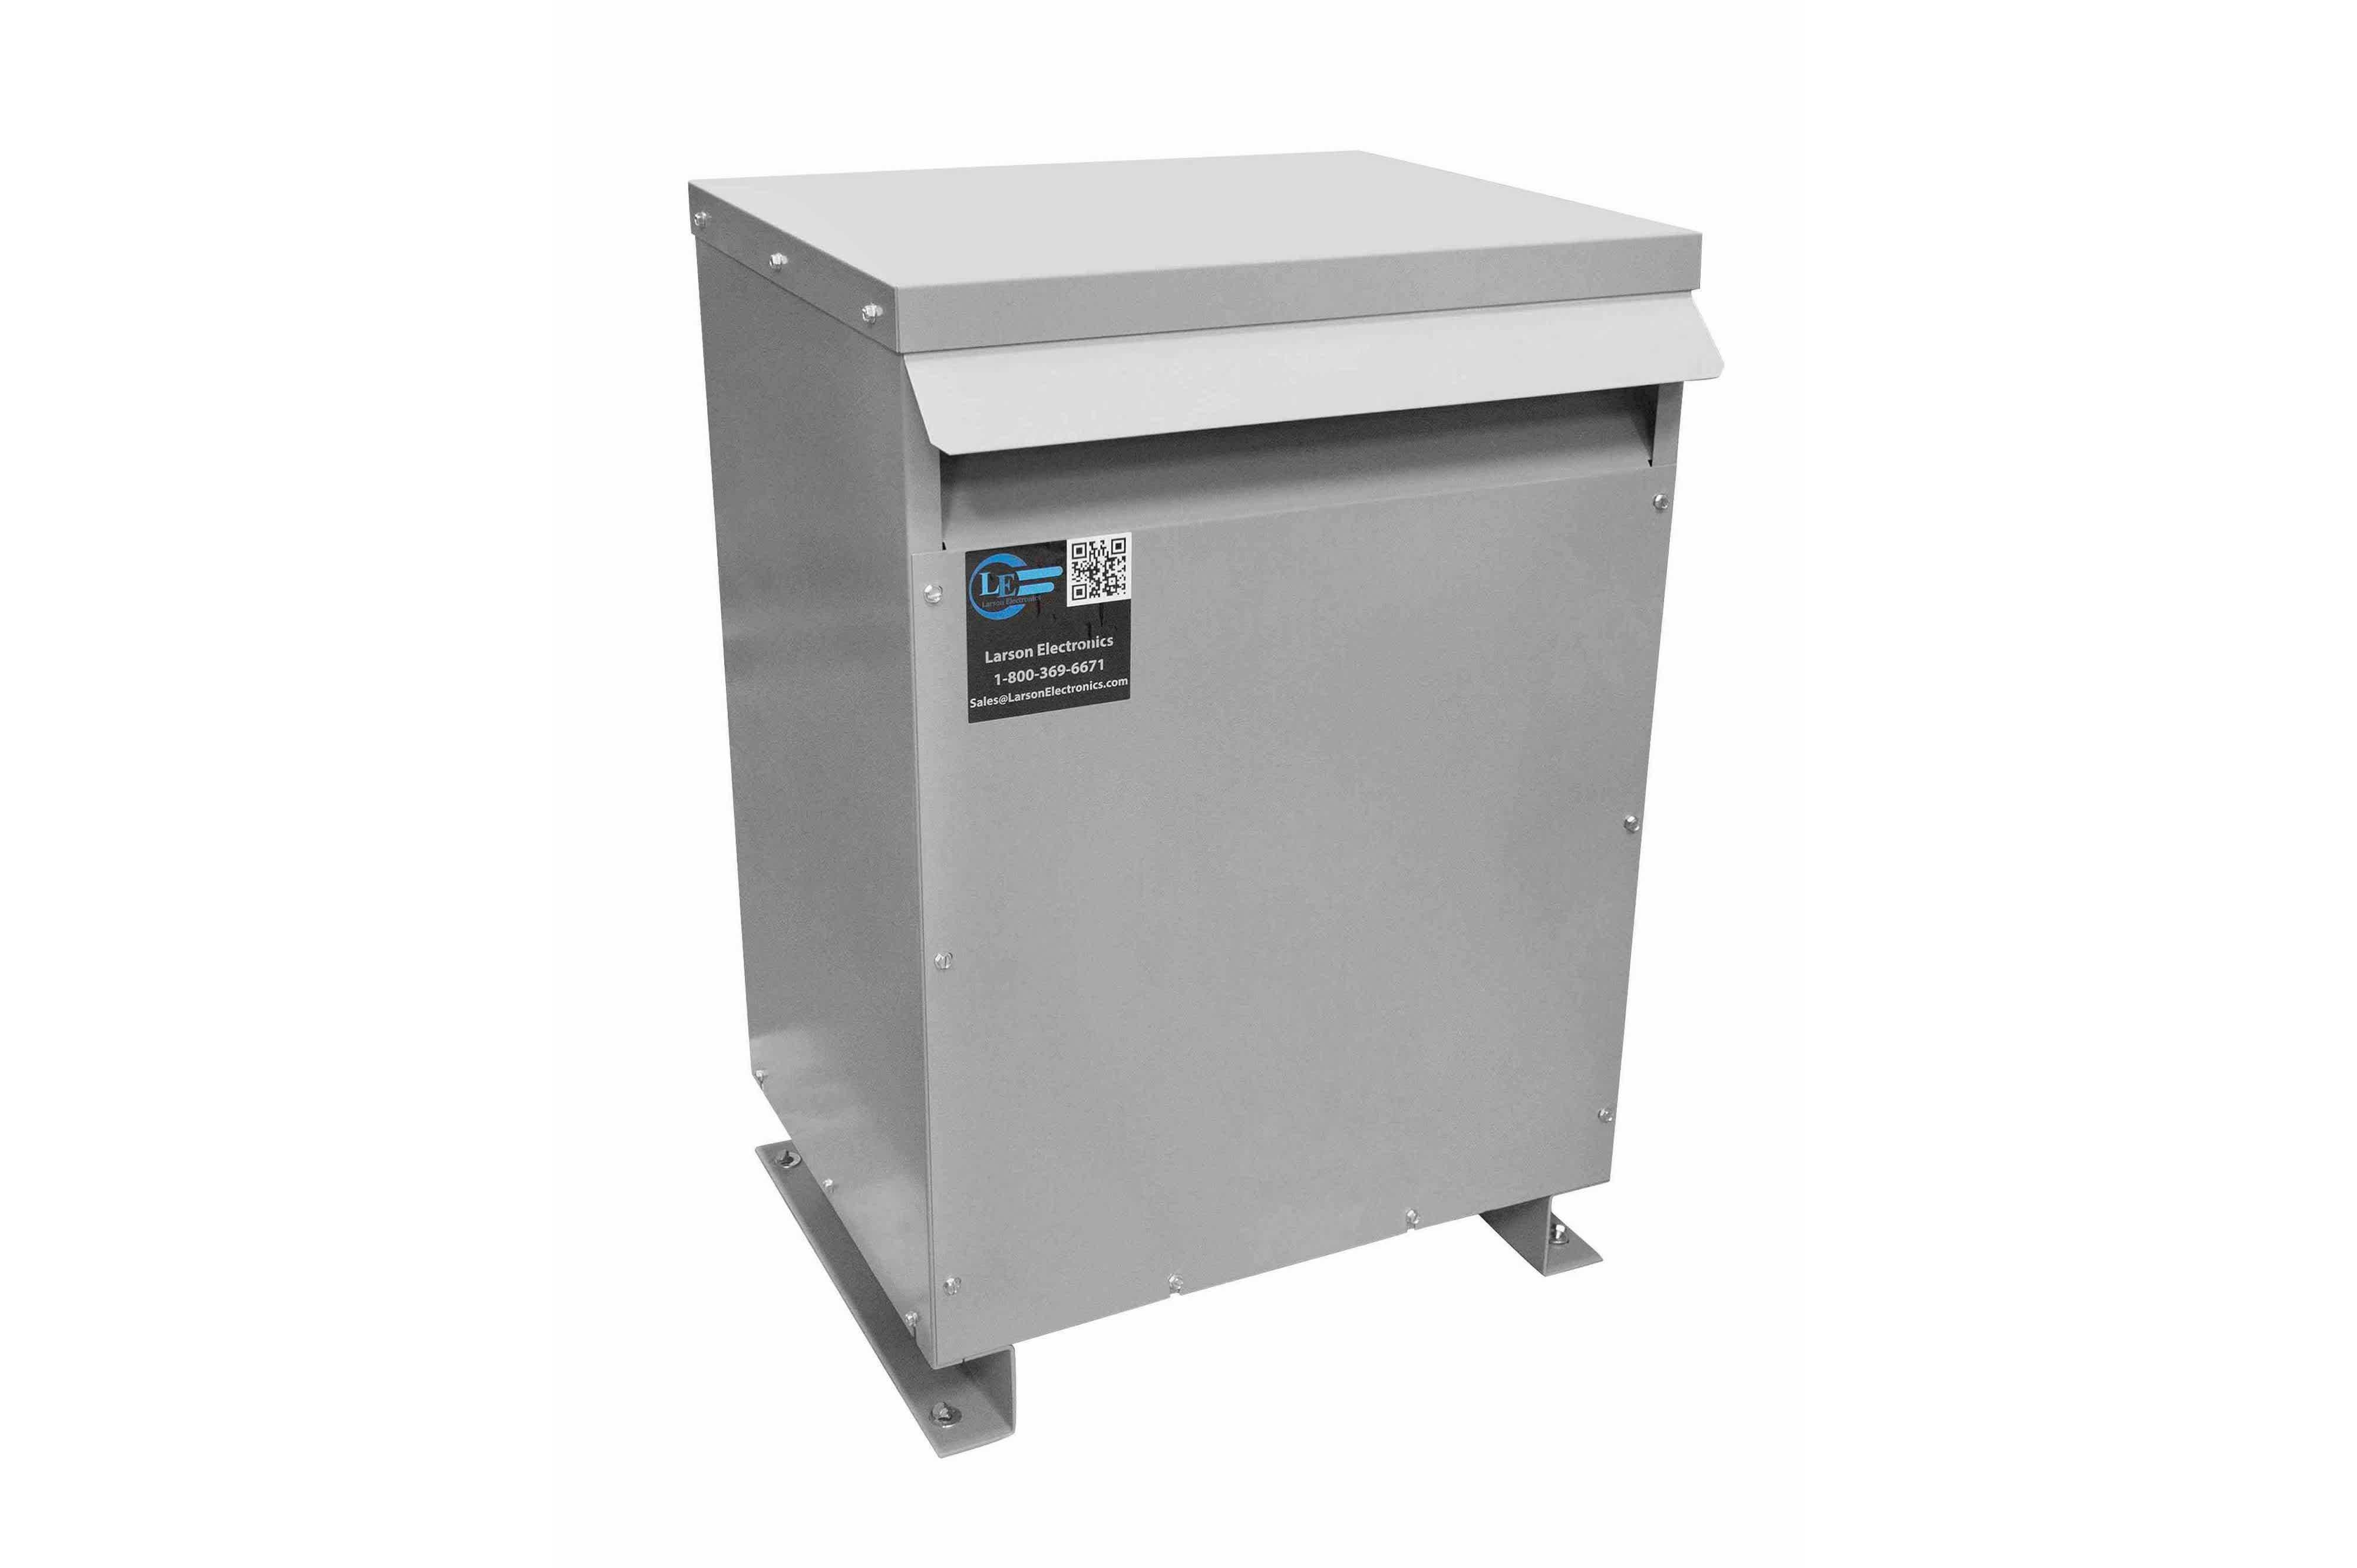 27 kVA 3PH Isolation Transformer, 208V Wye Primary, 600V Delta Secondary, N3R, Ventilated, 60 Hz